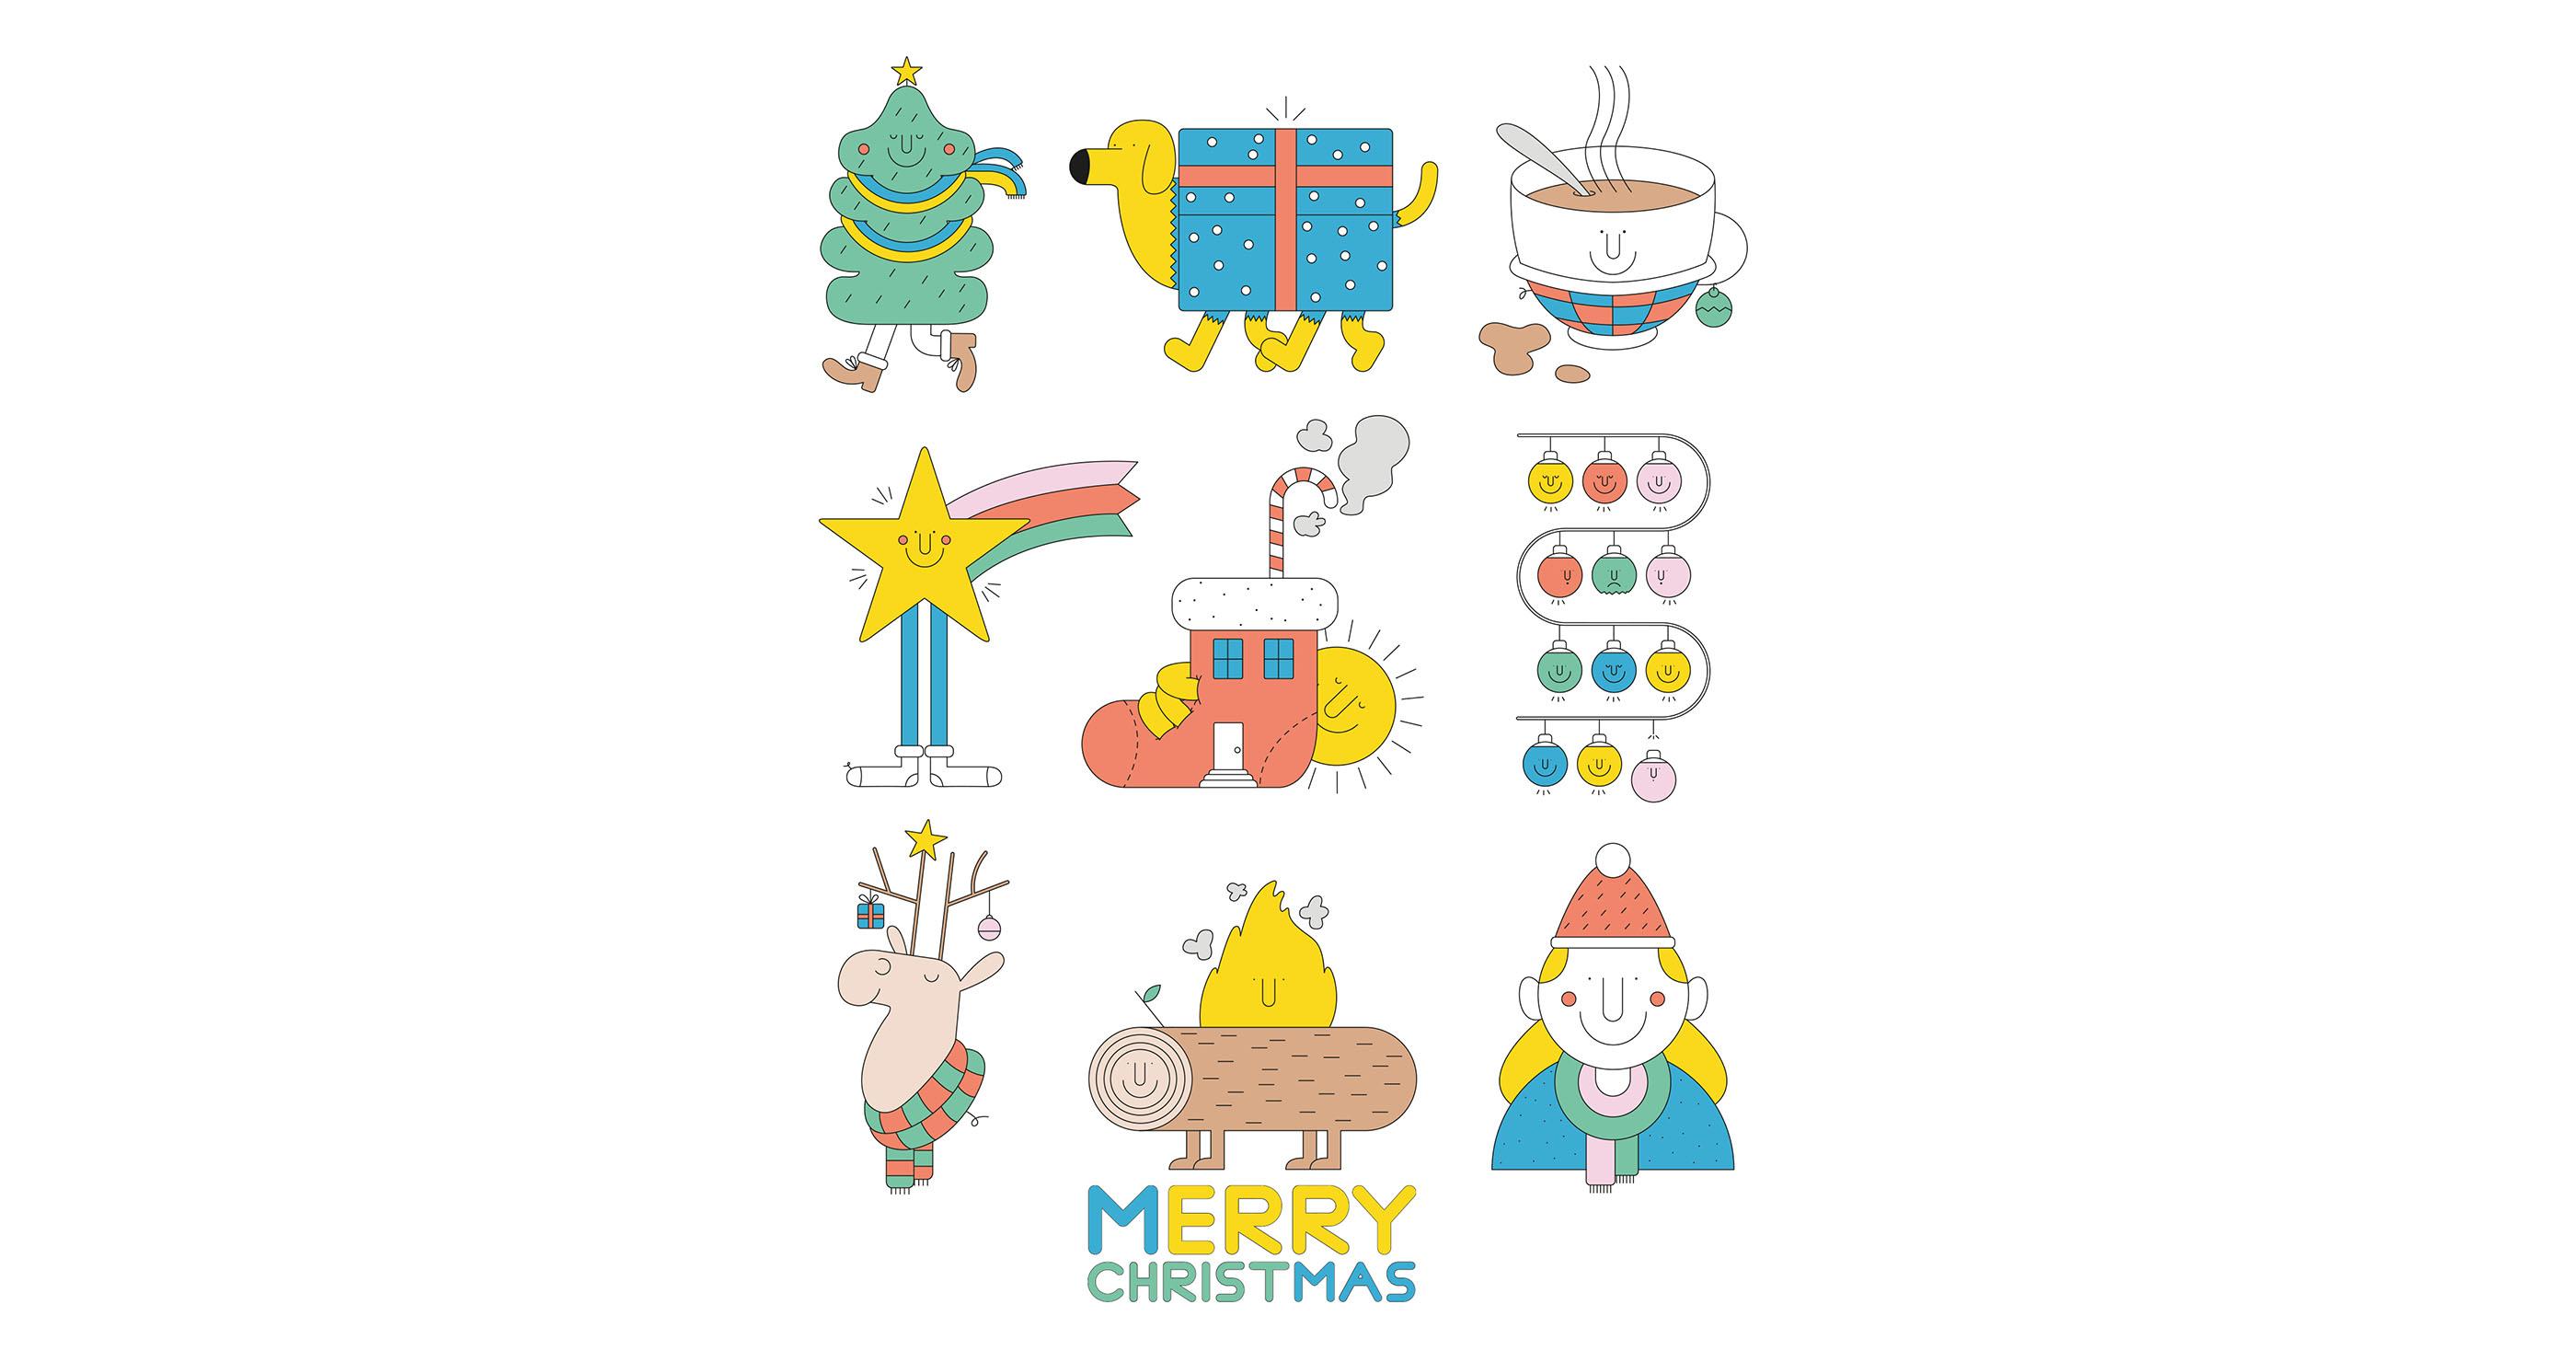 illustrations thomas gaudinet Merry Christmas